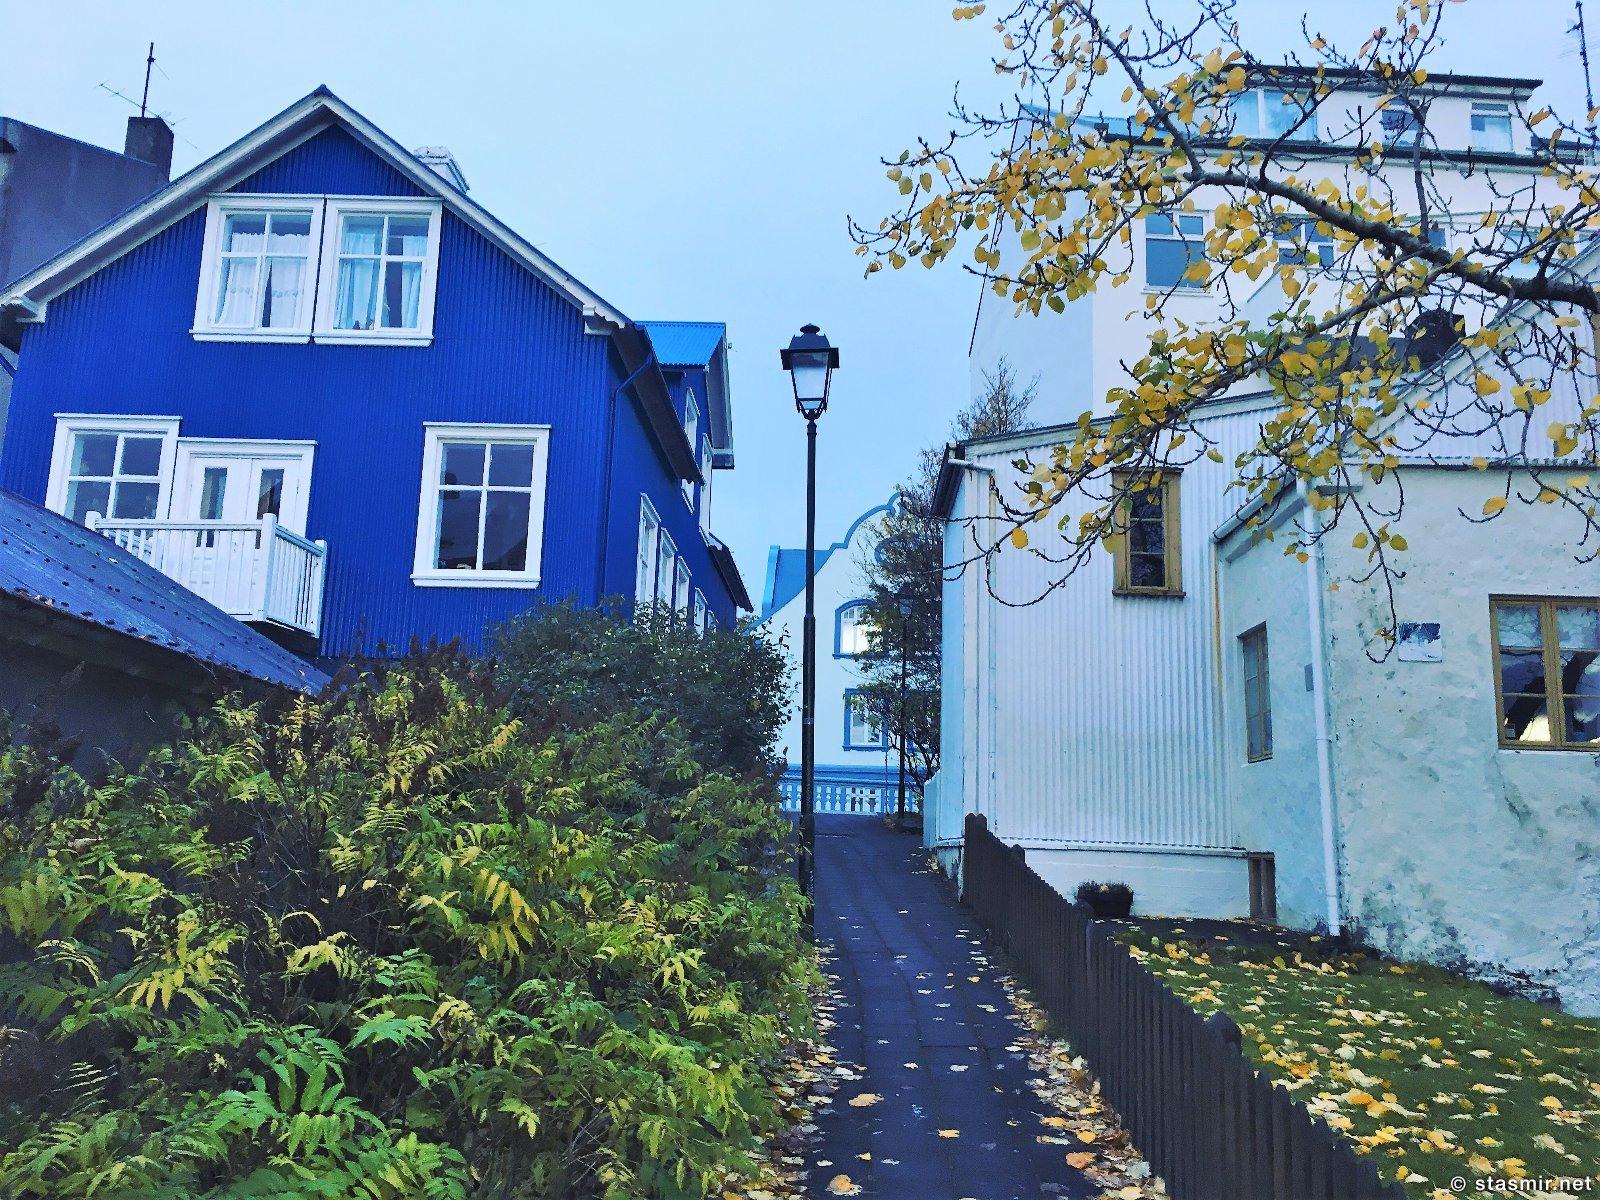 улица Фишерсунд в Рейкьявике, фото Стасмир, photo Stasmir